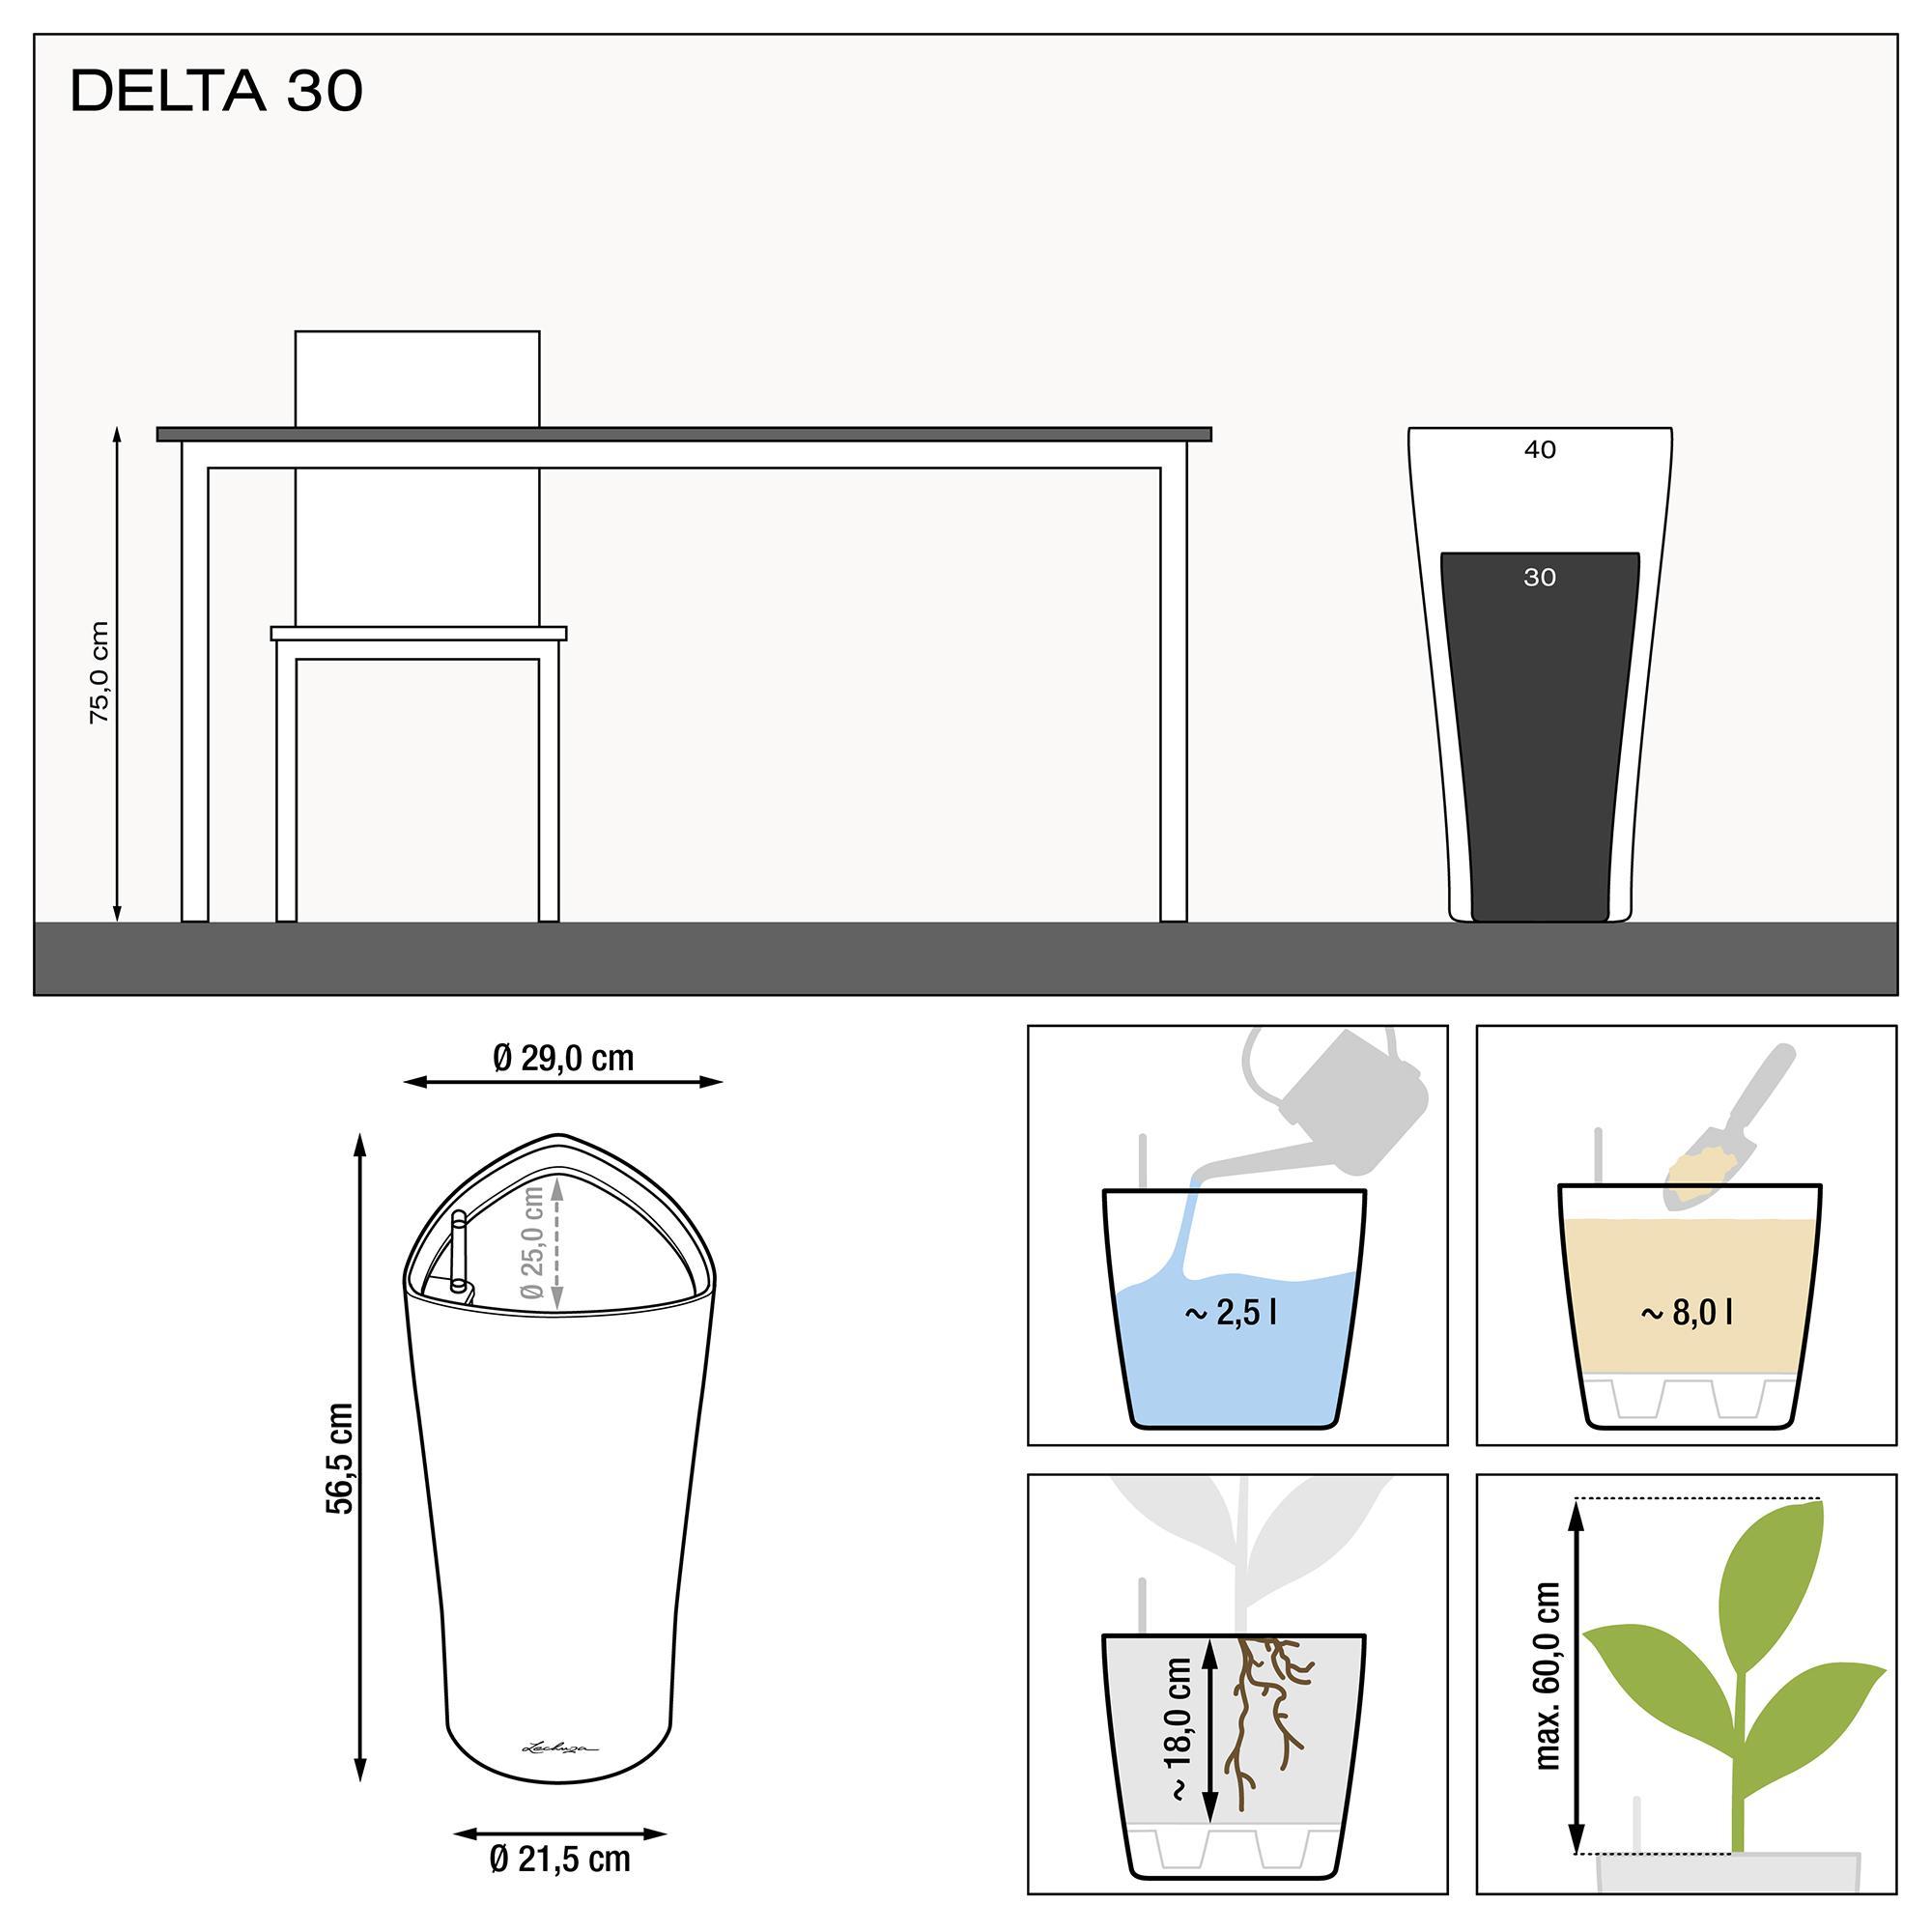 DELTA 30 white high-gloss - Image 3